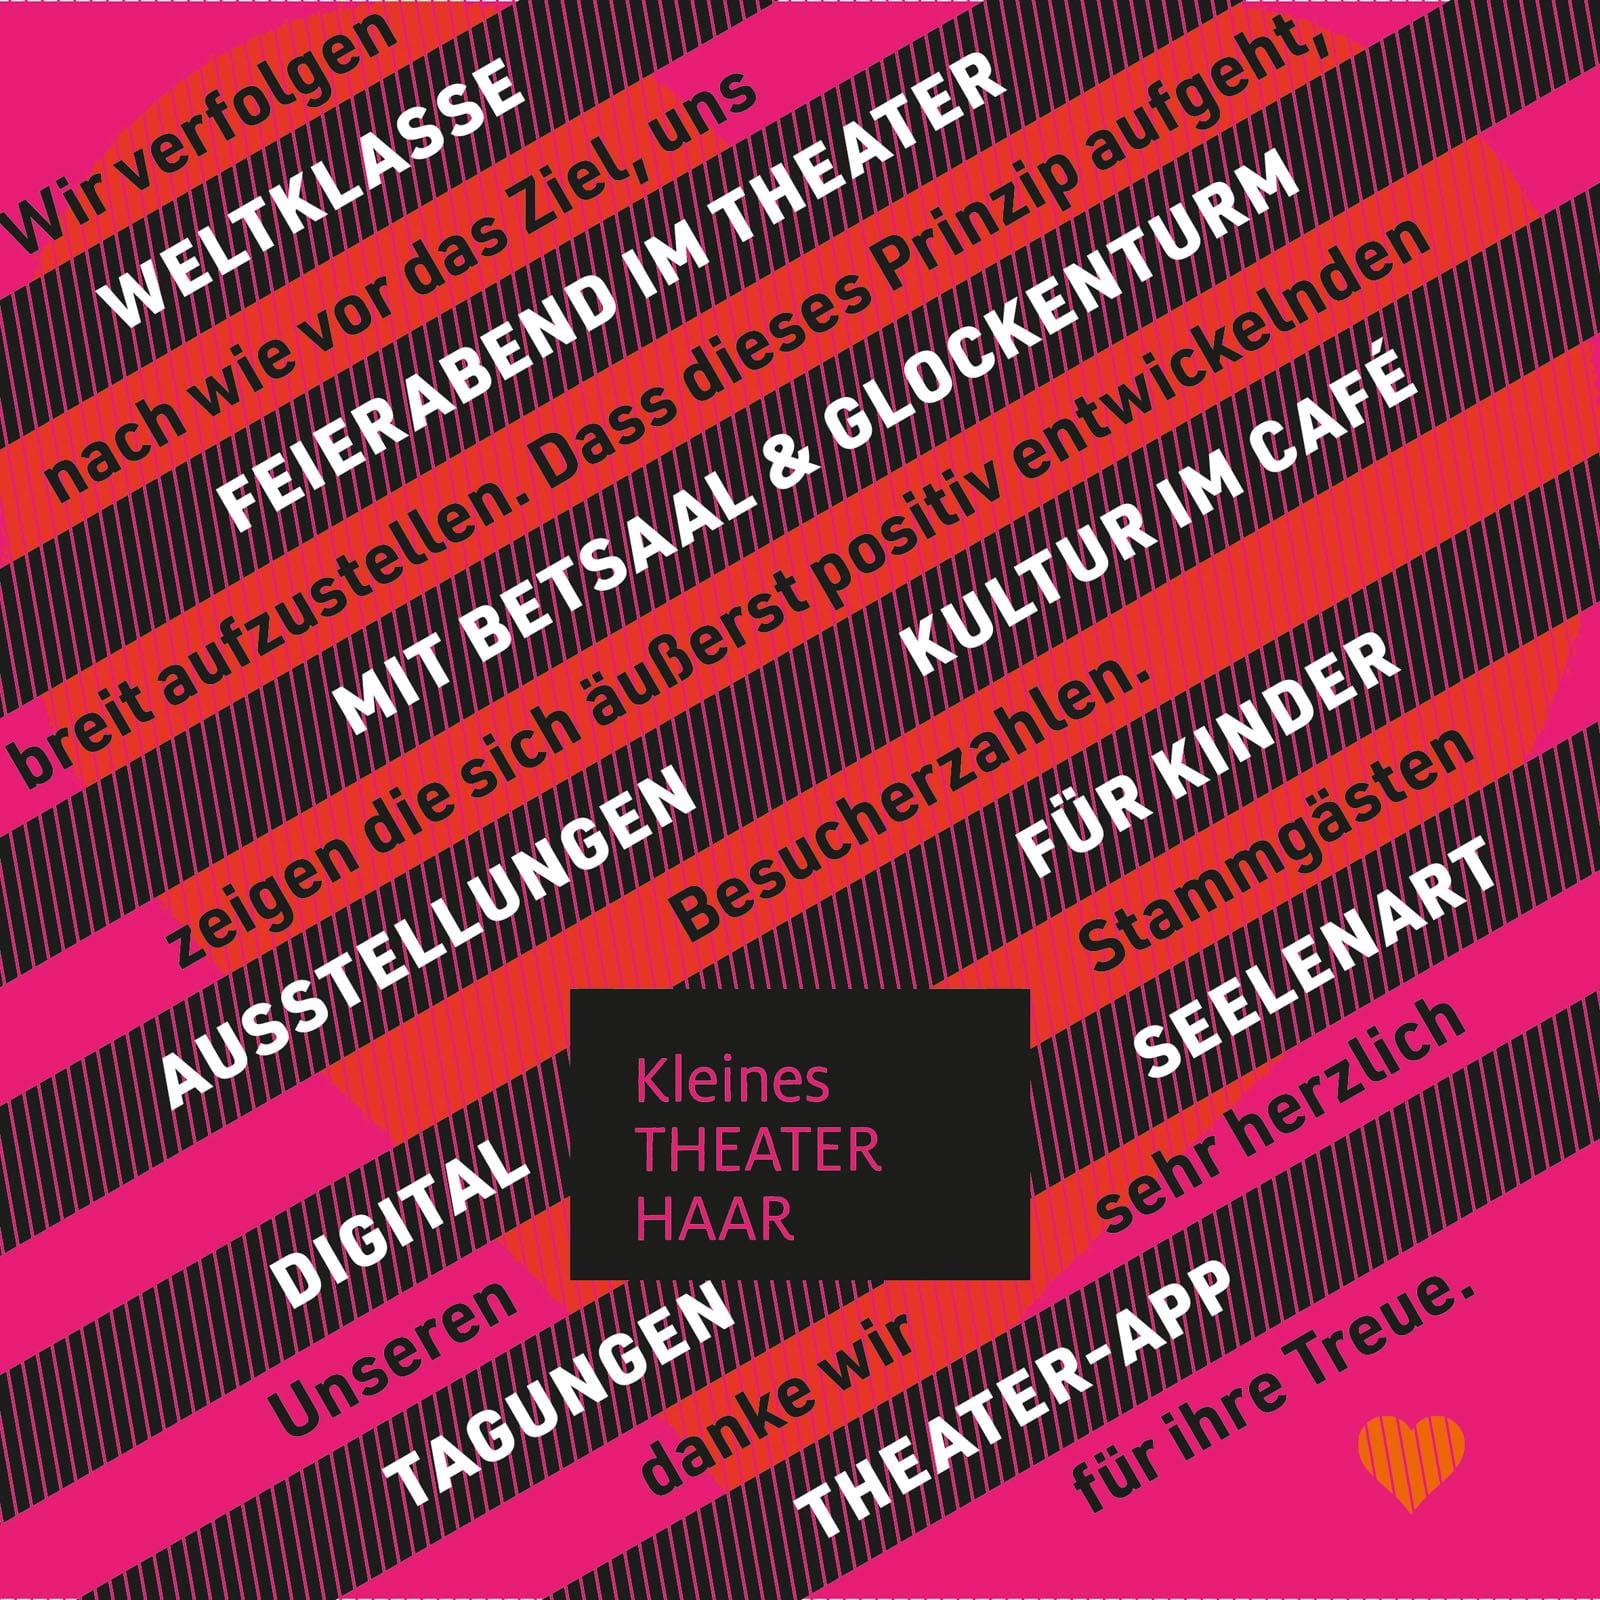 99 Culture Books: Kleines Theater Haar, Plakat 5